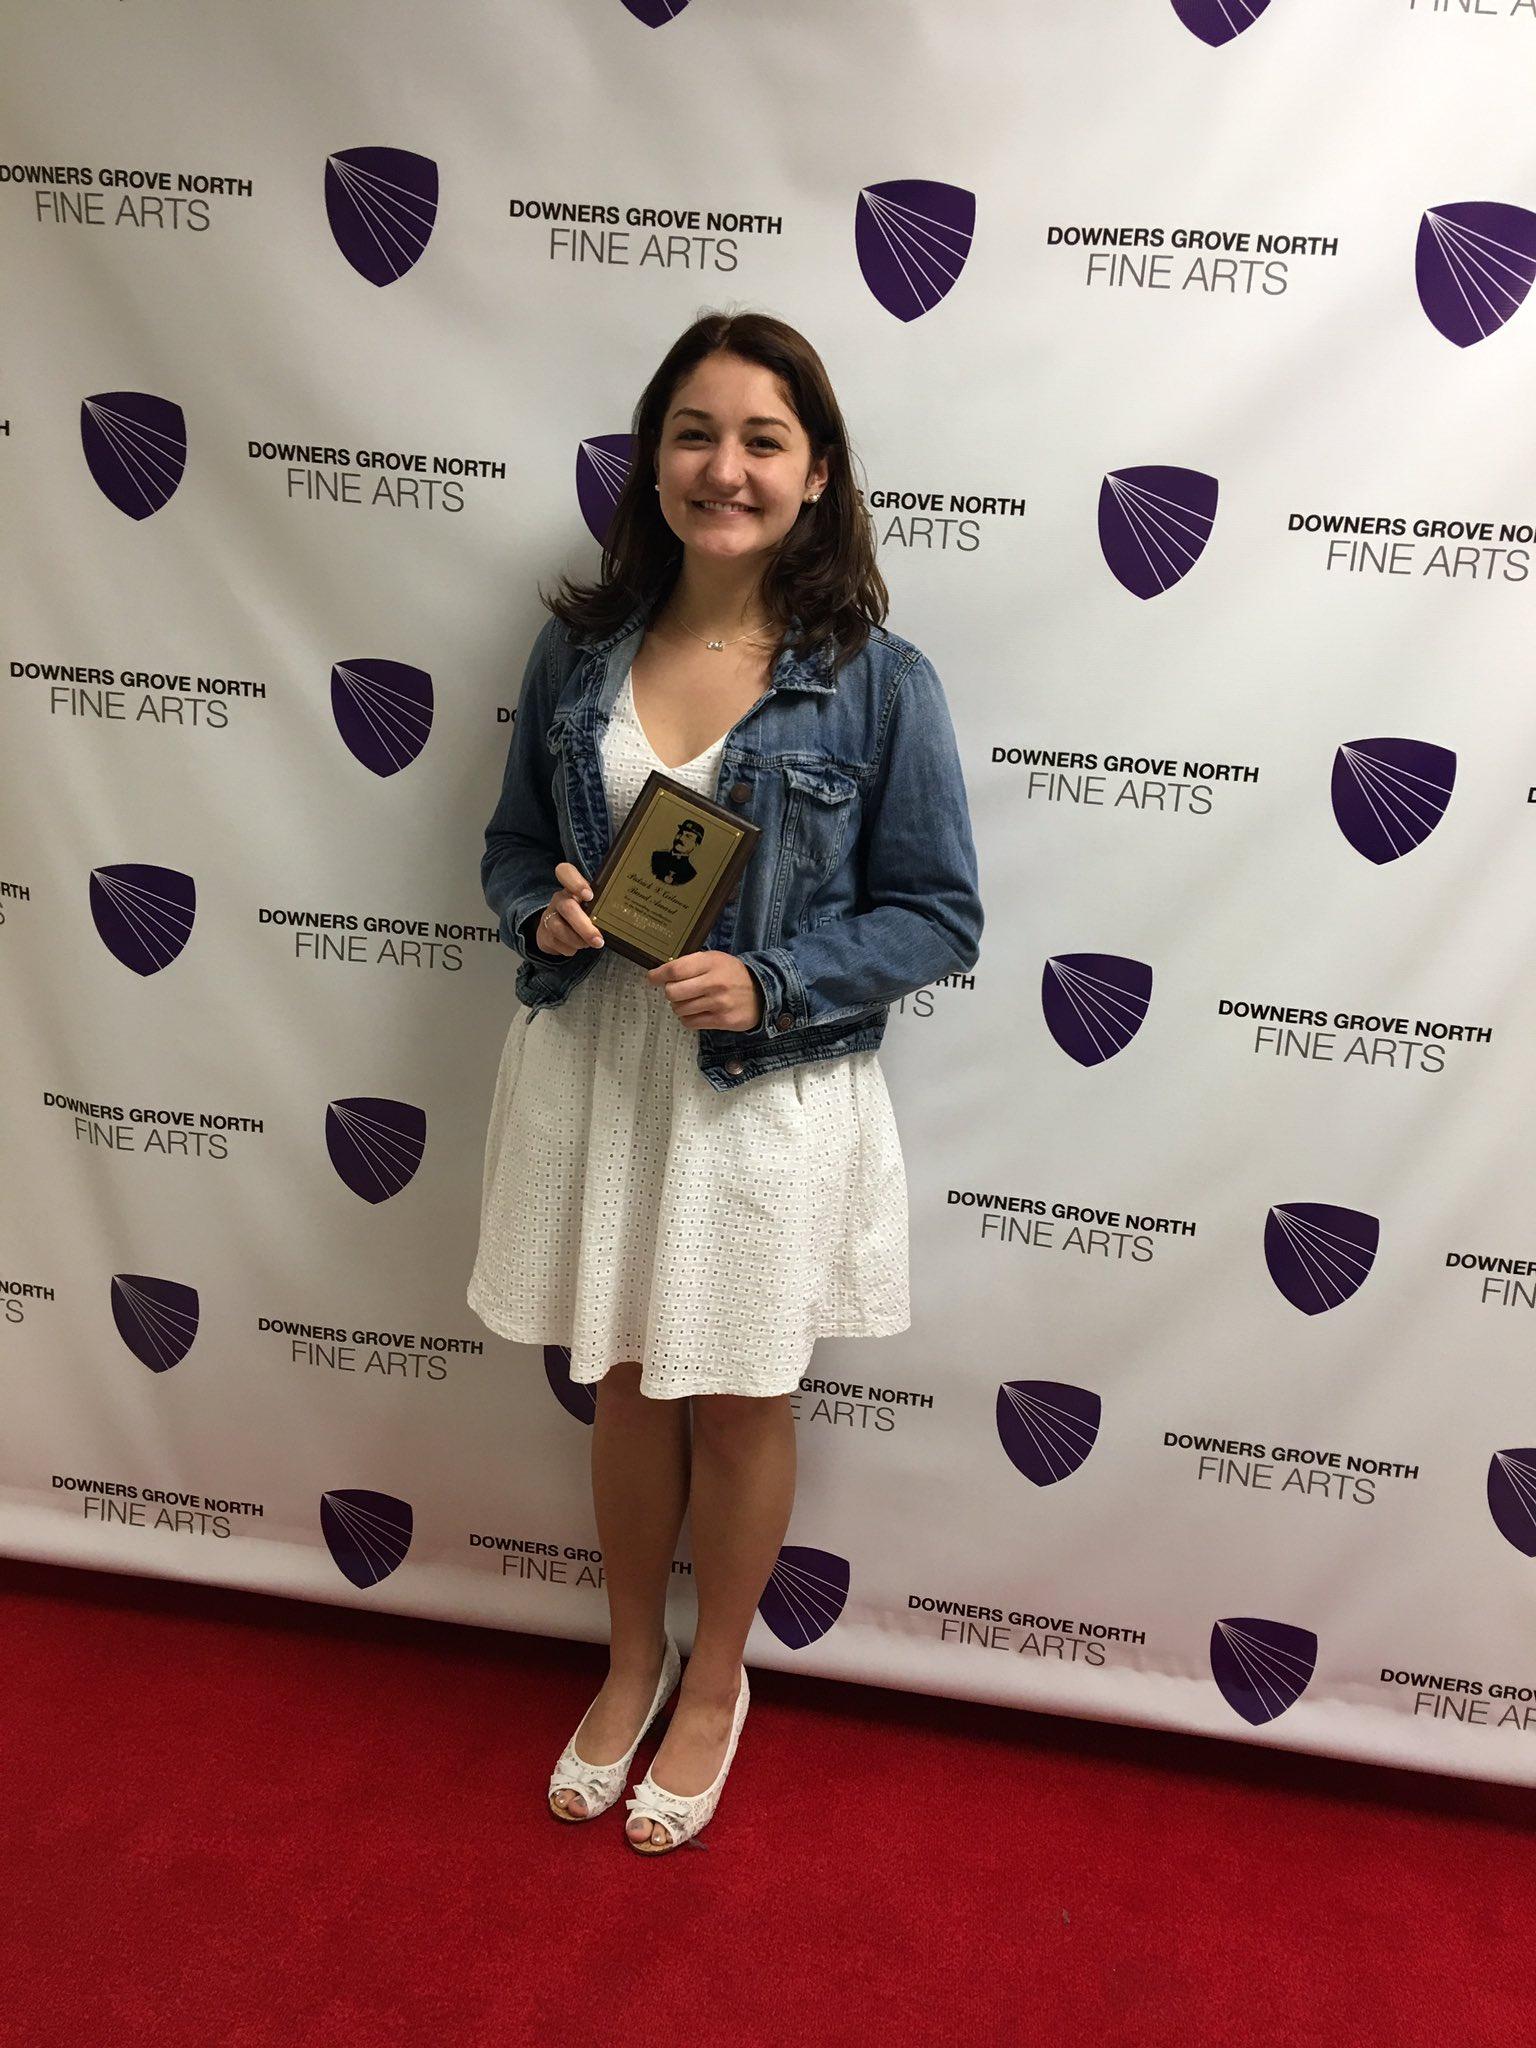 2016 Patrick S. Gilmore Band Award: Alyse Bondarowicz #WeAreDGN #99Learns https://t.co/wnTJtY2GlF